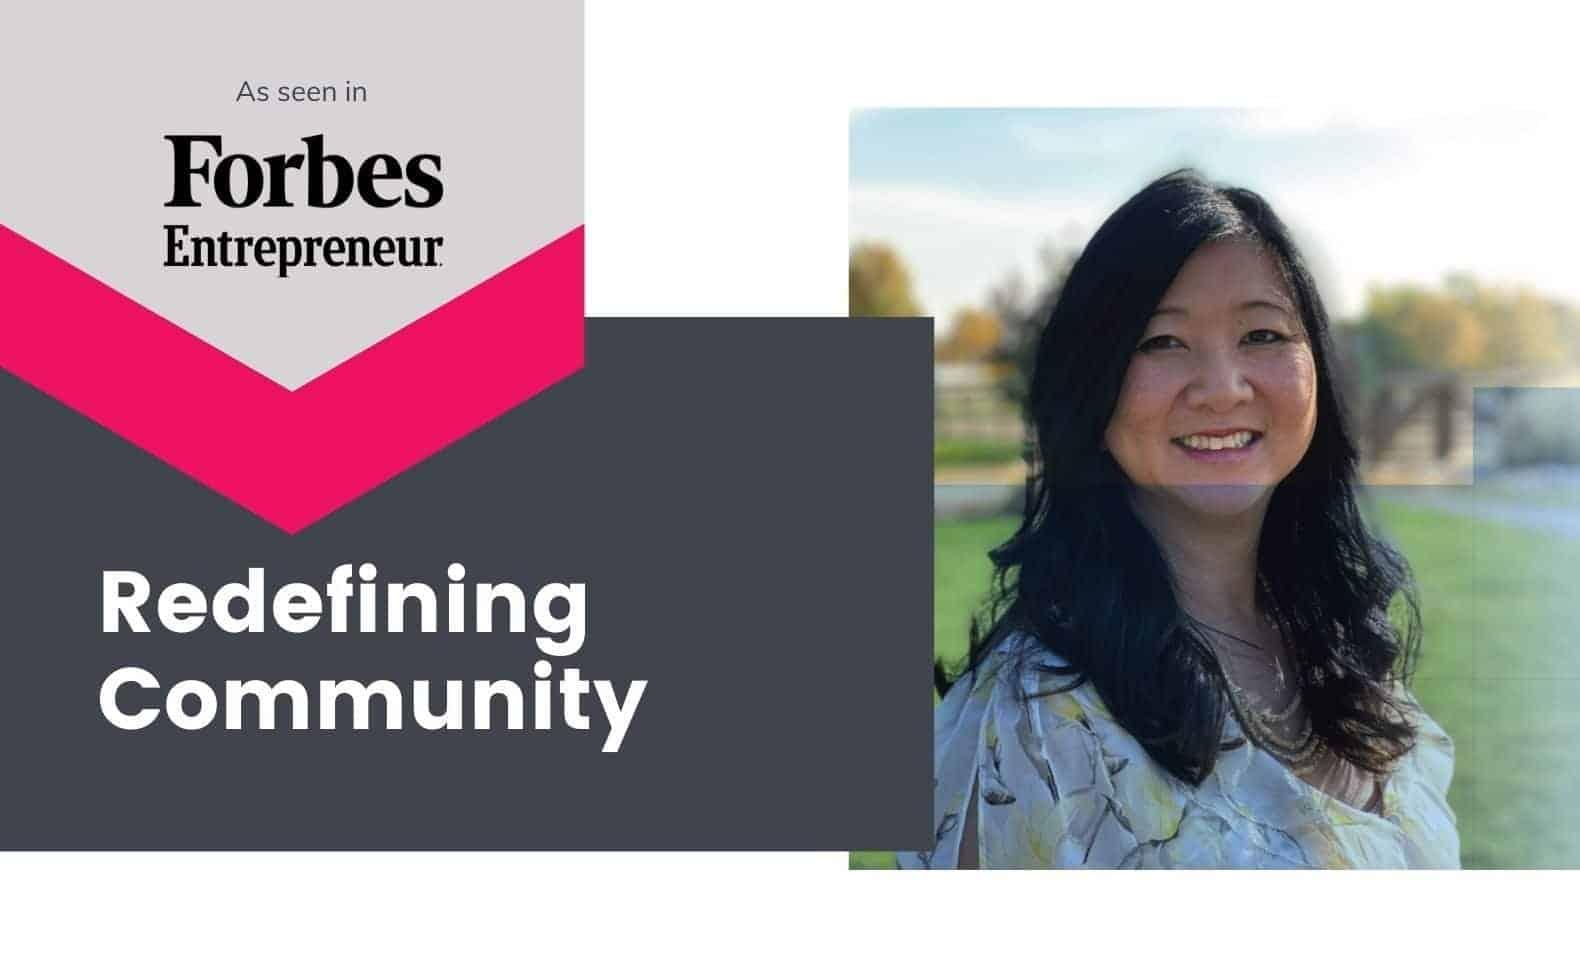 As seen in Forbes & Entrepreneur: Redefining Community